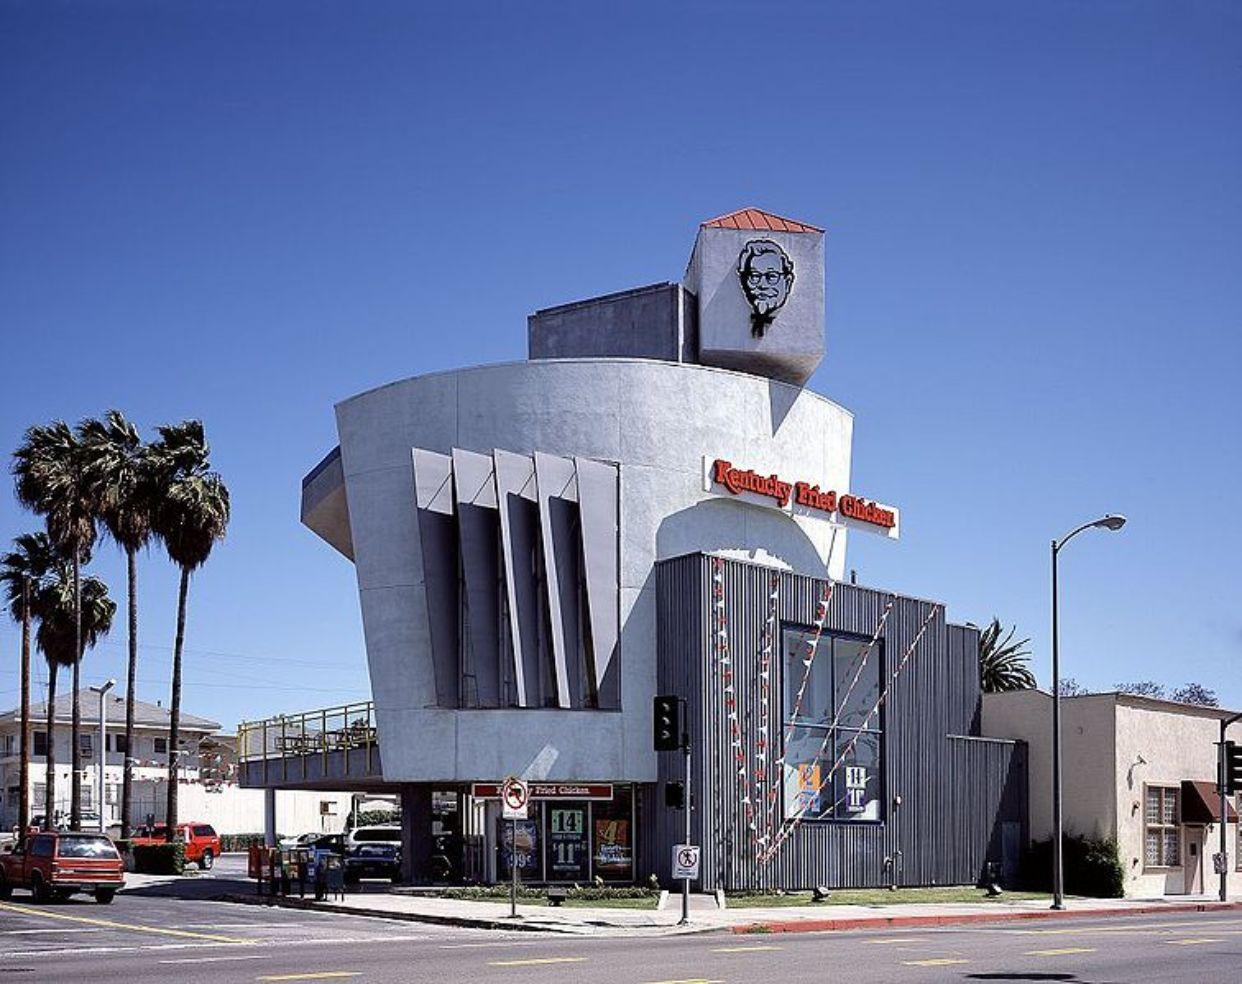 A futuristic Kentucky Friend Chicken in Los Angeles.